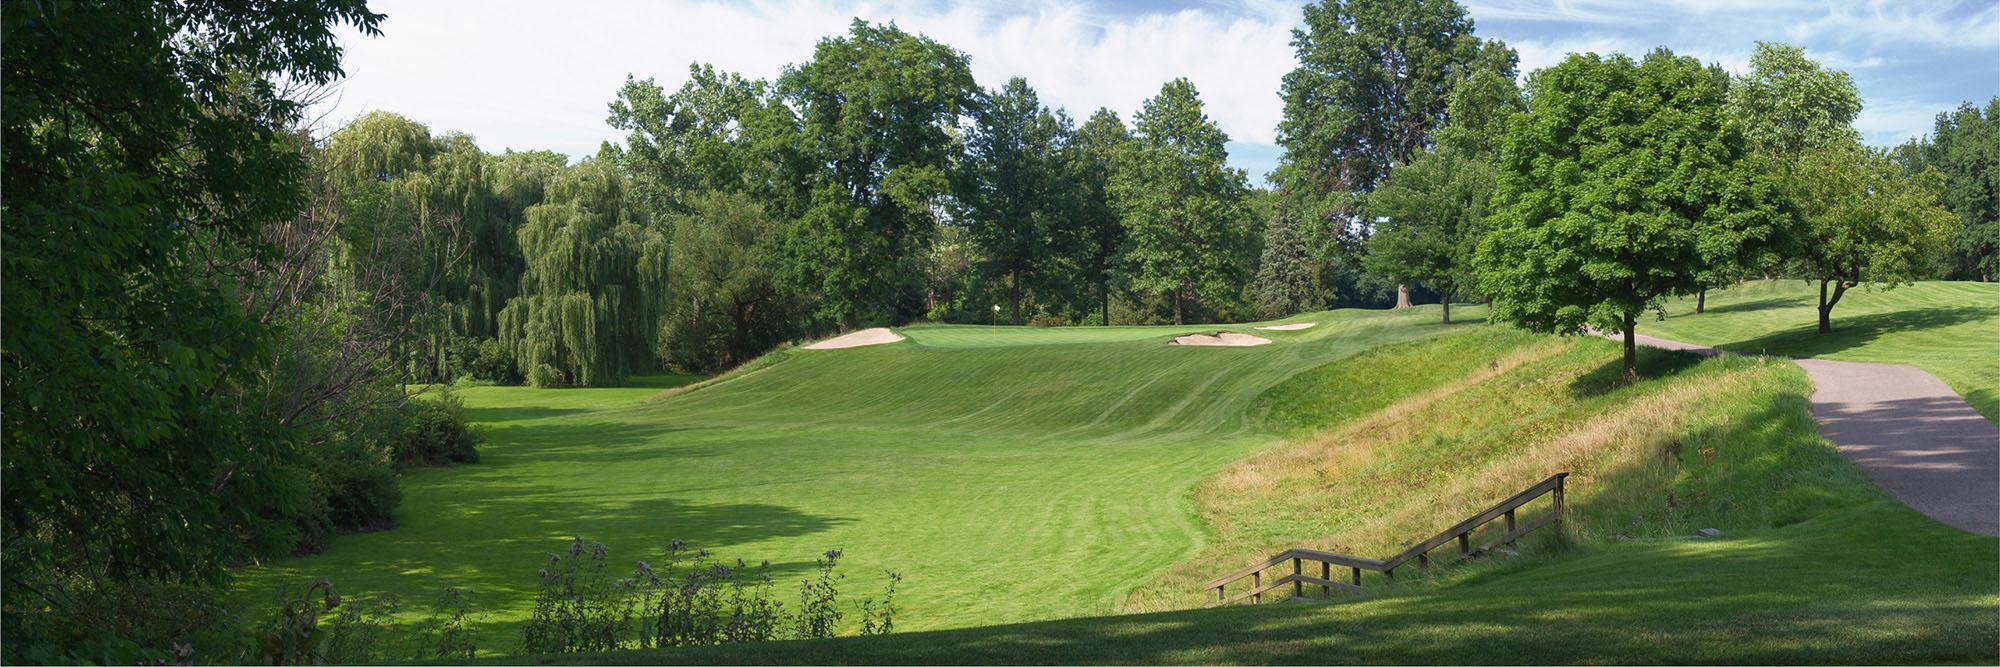 Golf Course Image - Canterbury No. 7